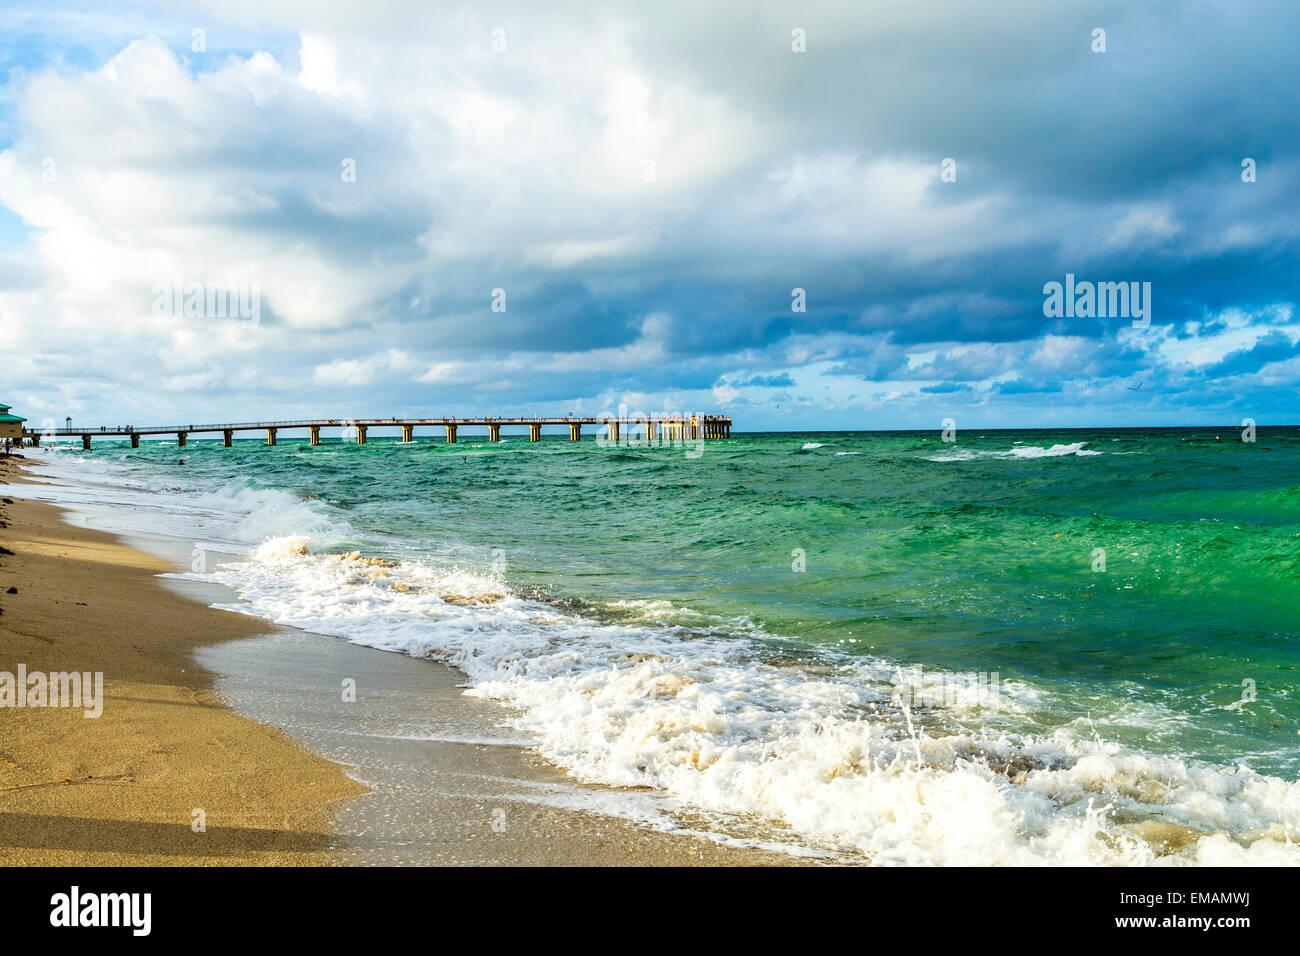 Jetée à Sunny Isles Beach à Miami, Floride Photo Stock